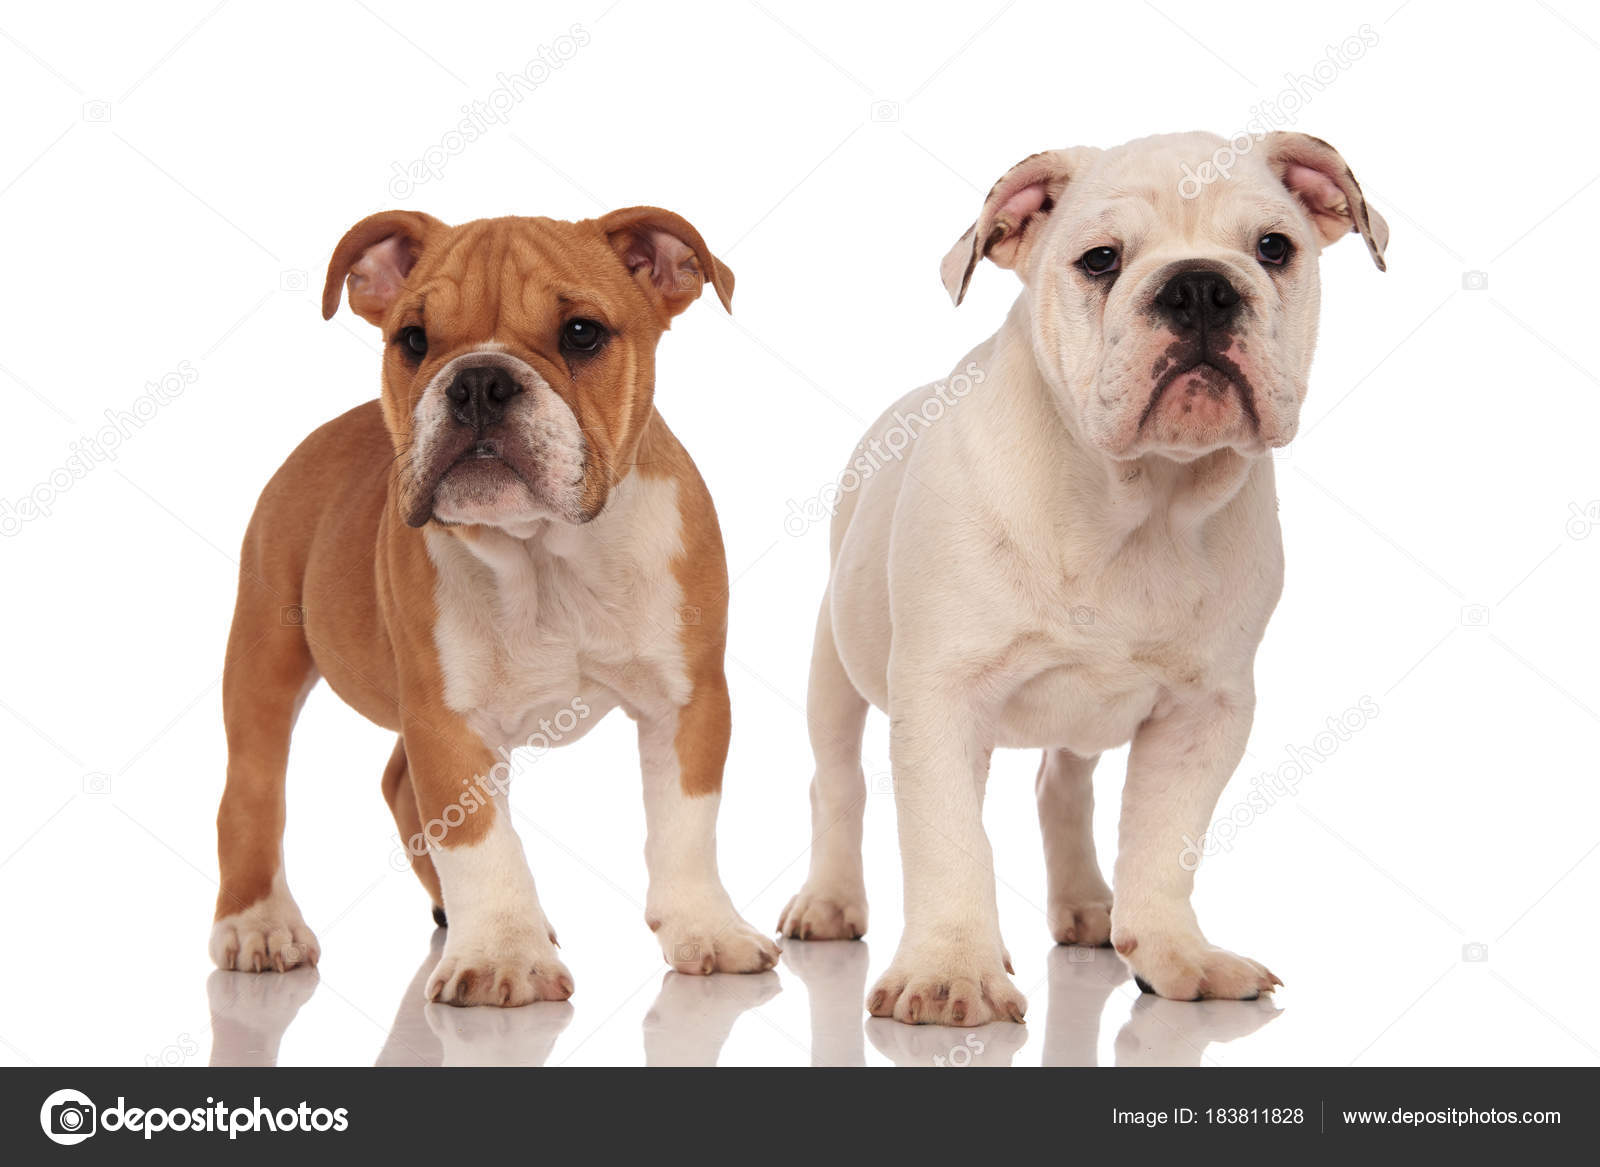 Pics: brown bulldog | Brown and white english bulldog